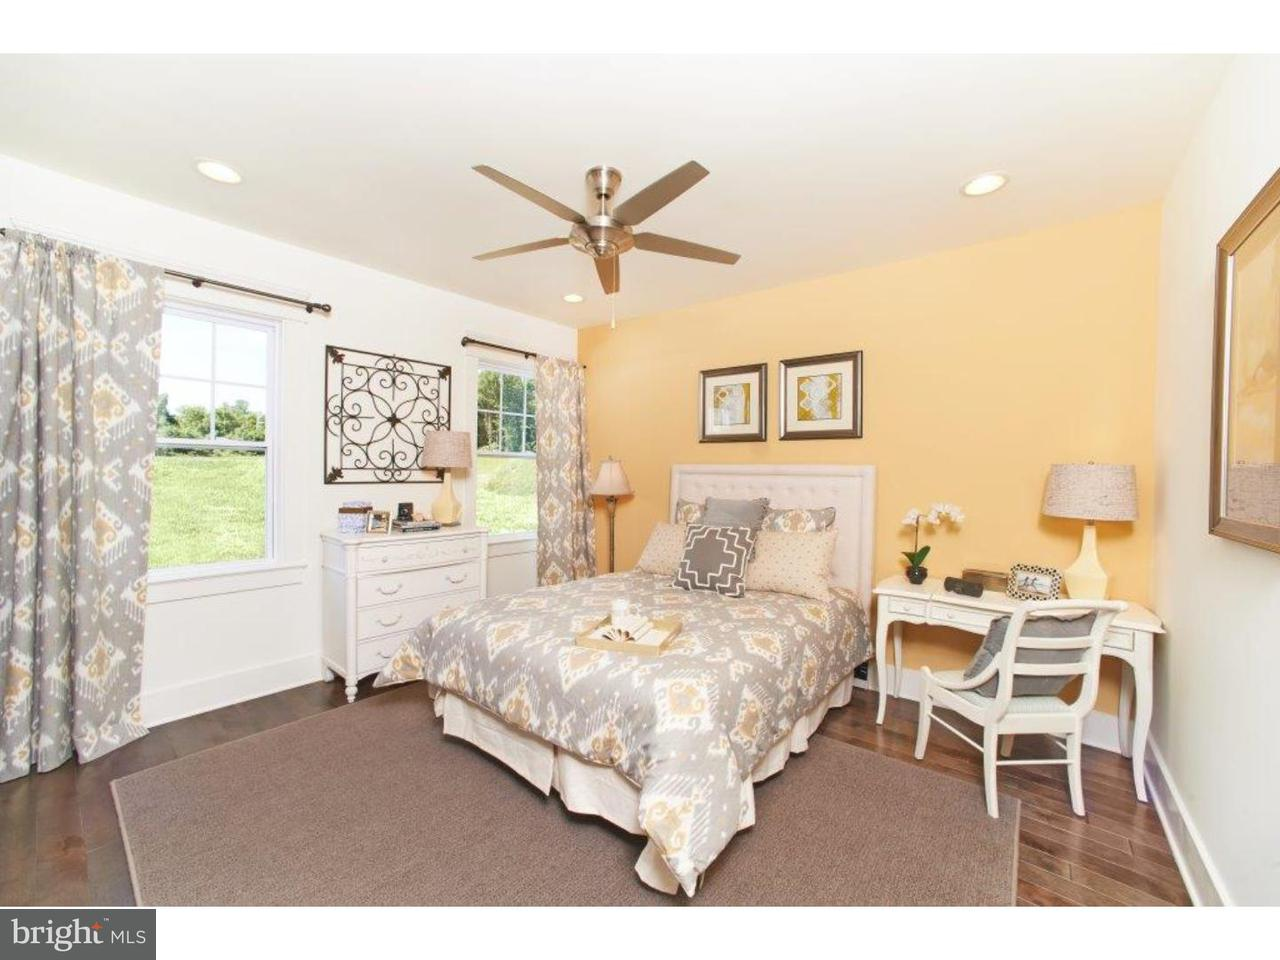 Additional photo for property listing at 133 SPRING OAK DR #00PYT  Malvern, Пенсильвания 19355 Соединенные Штаты